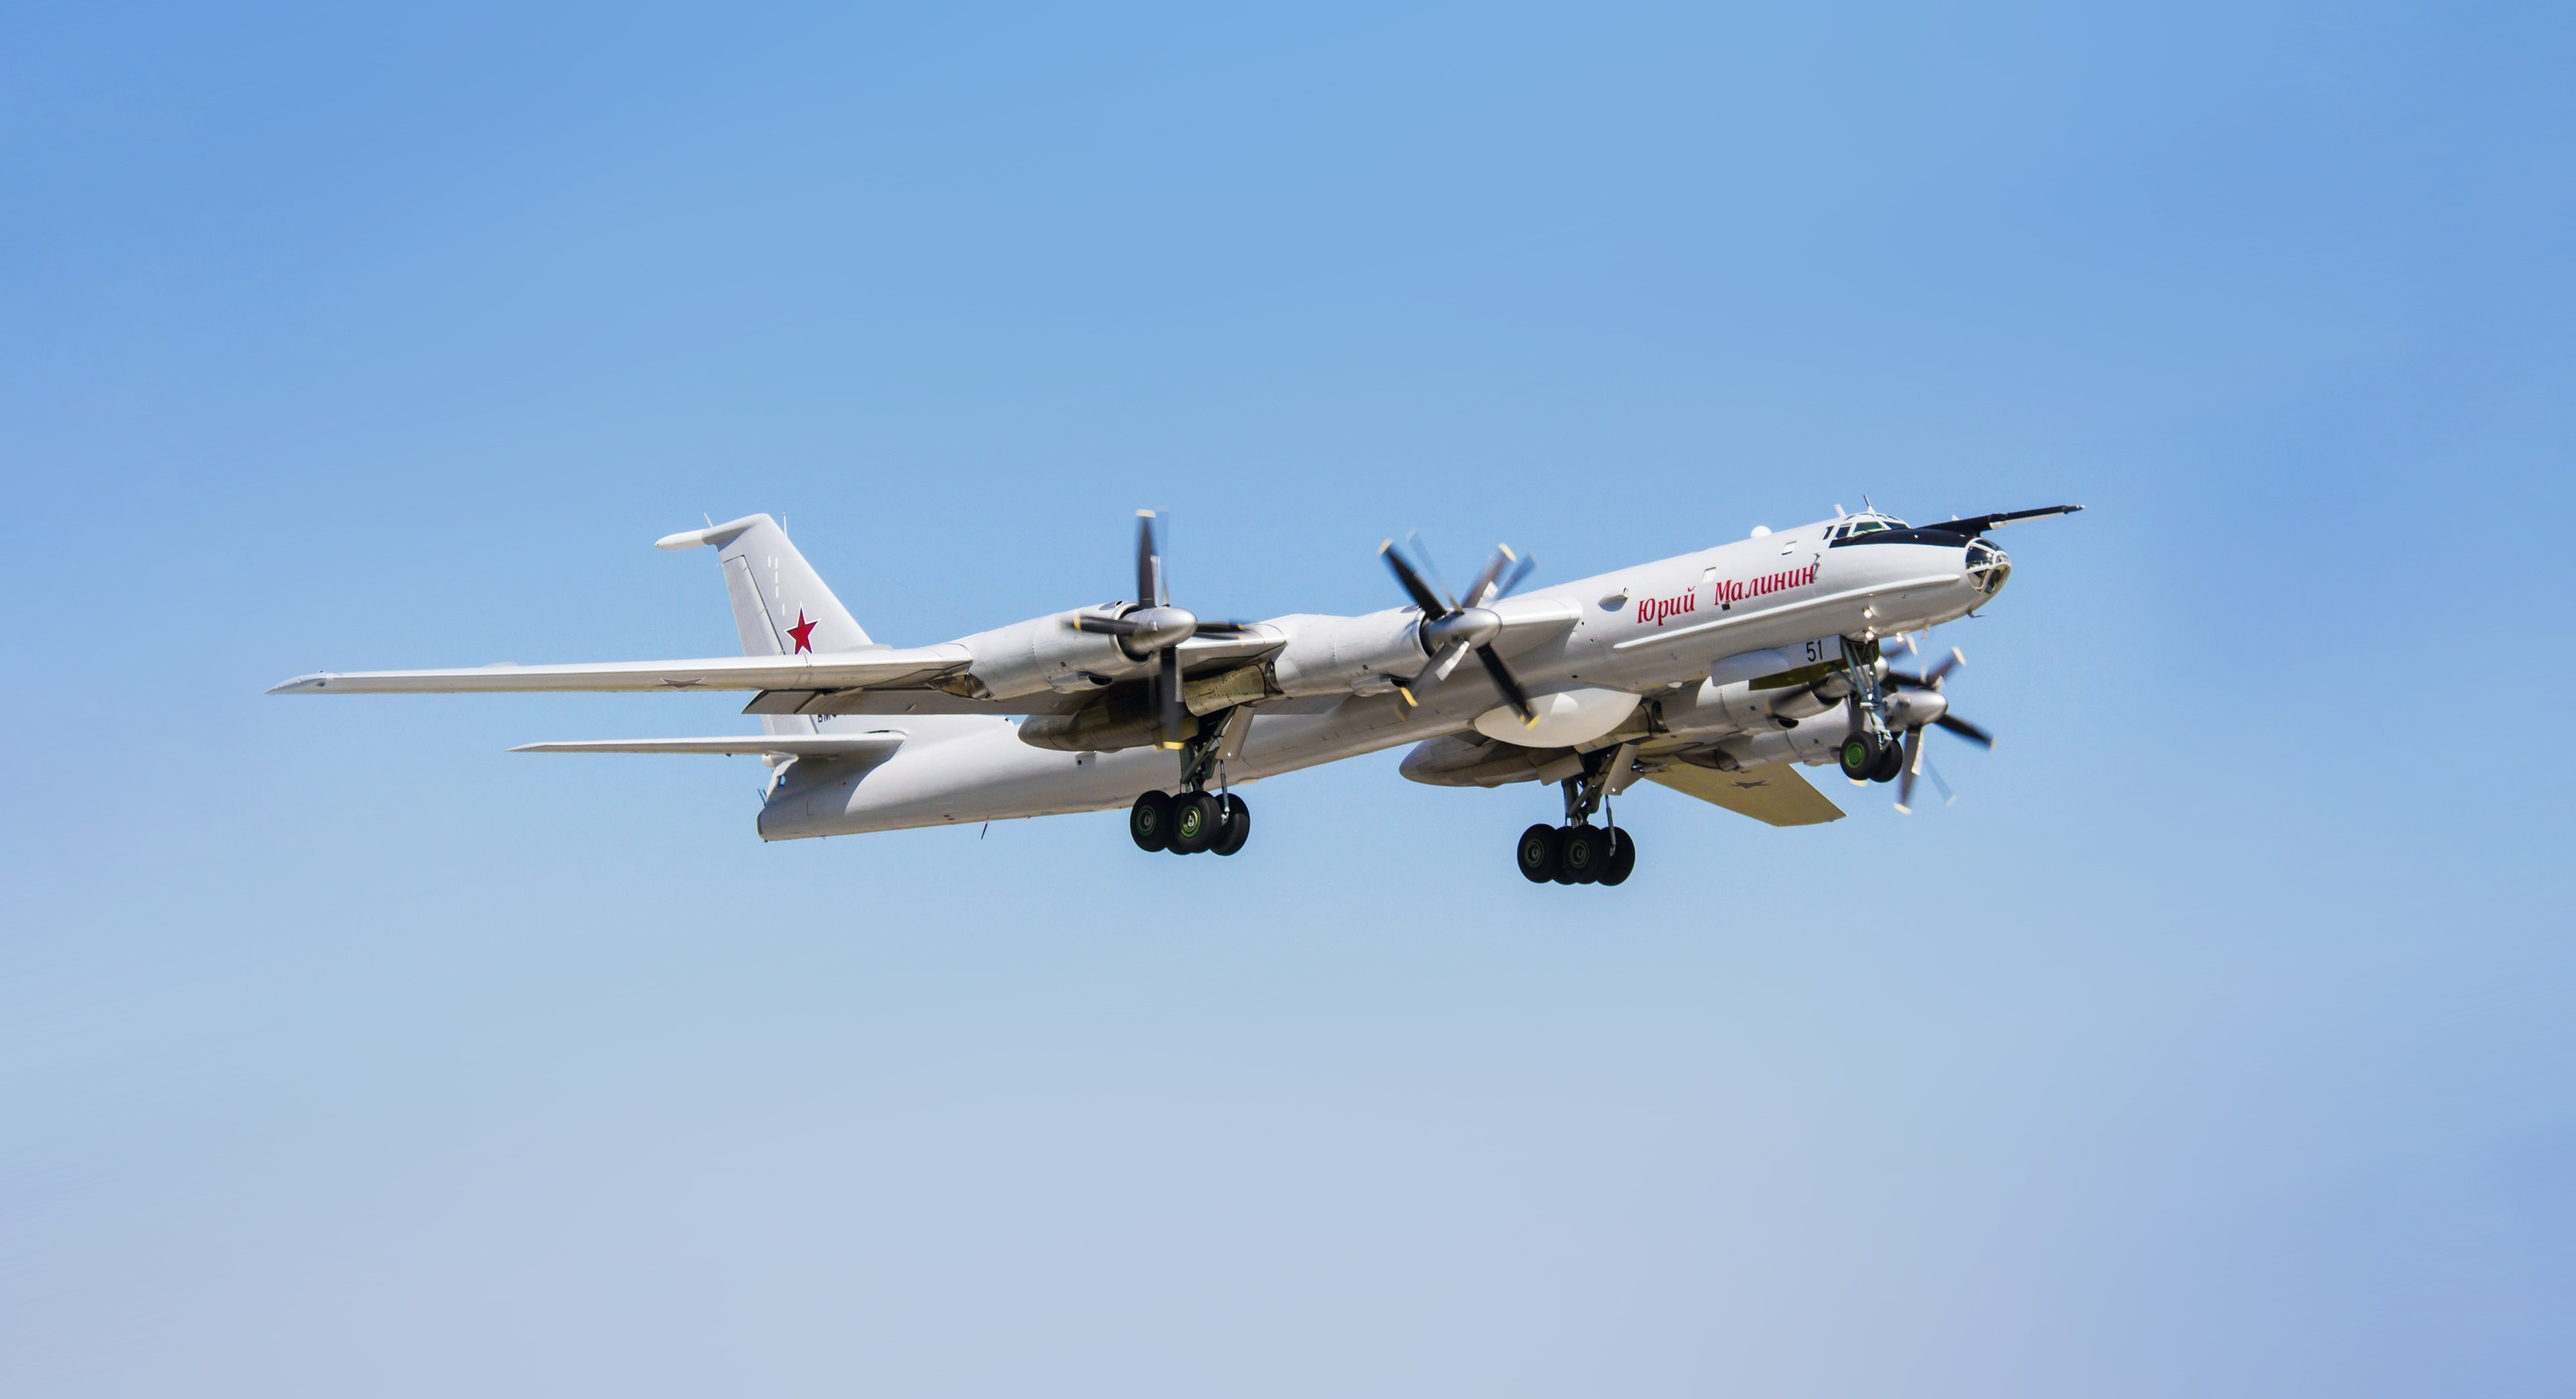 General 2738x1487 Russia vehicle aircraft military military aircraft Tupolev TU-142